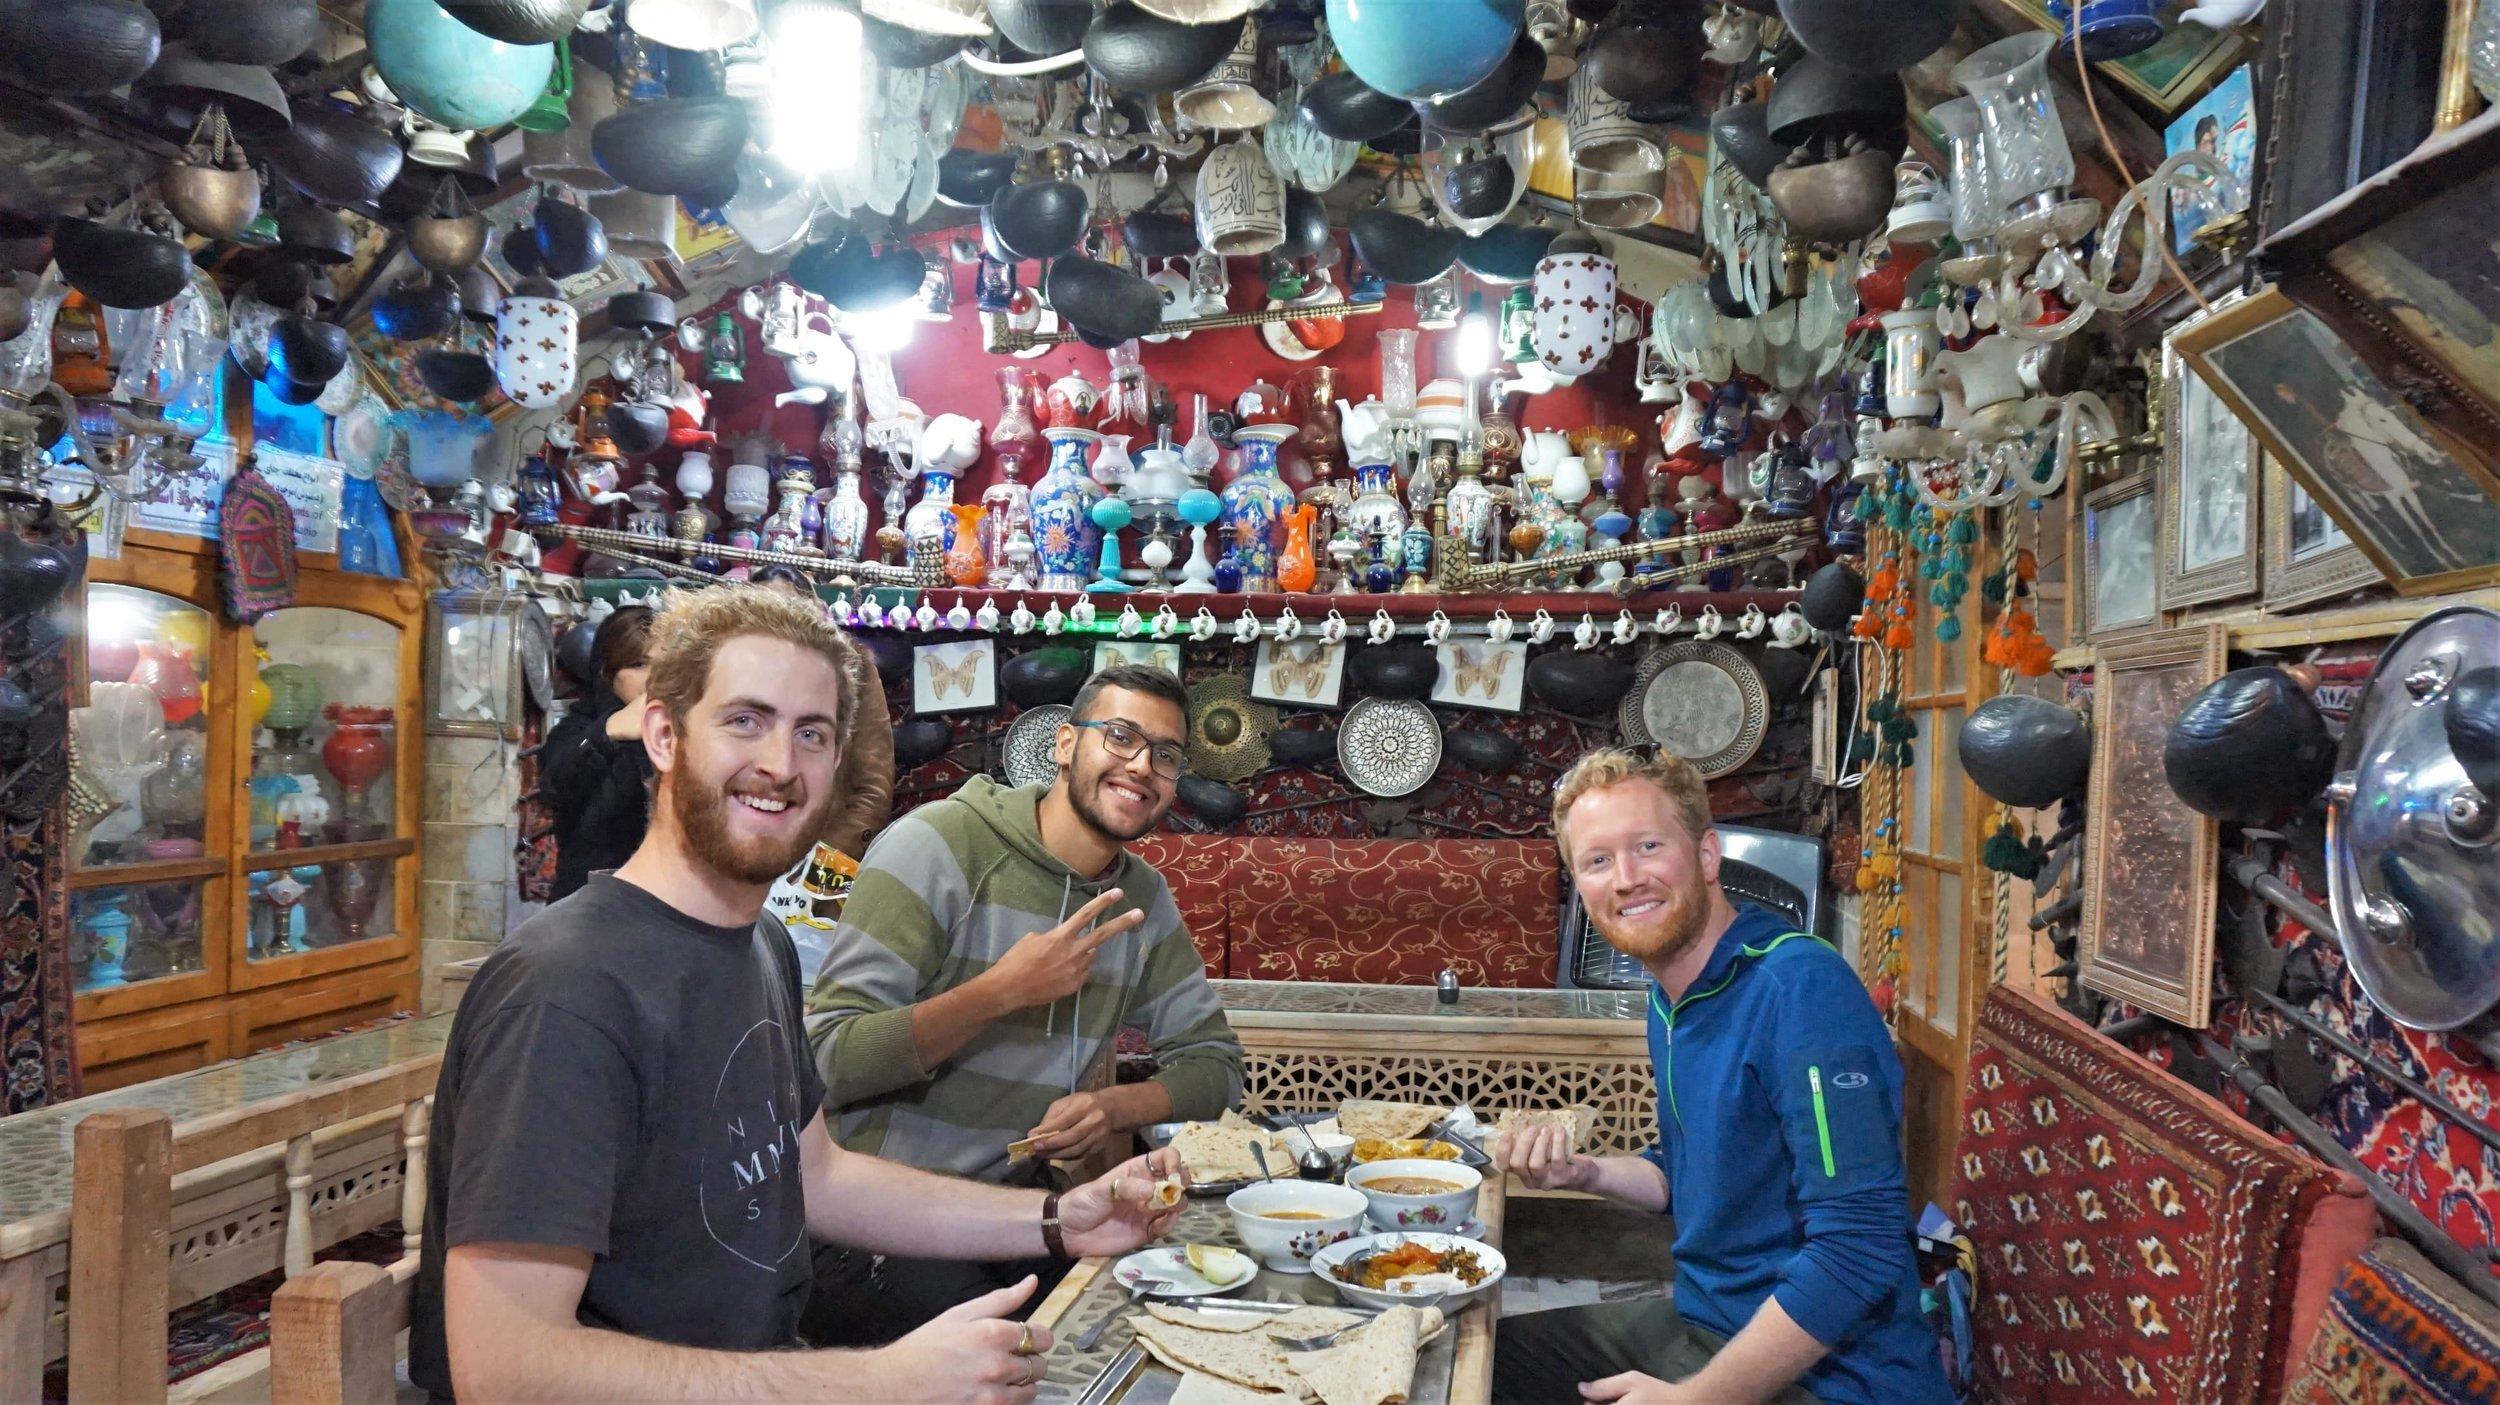 restaurants in Iran